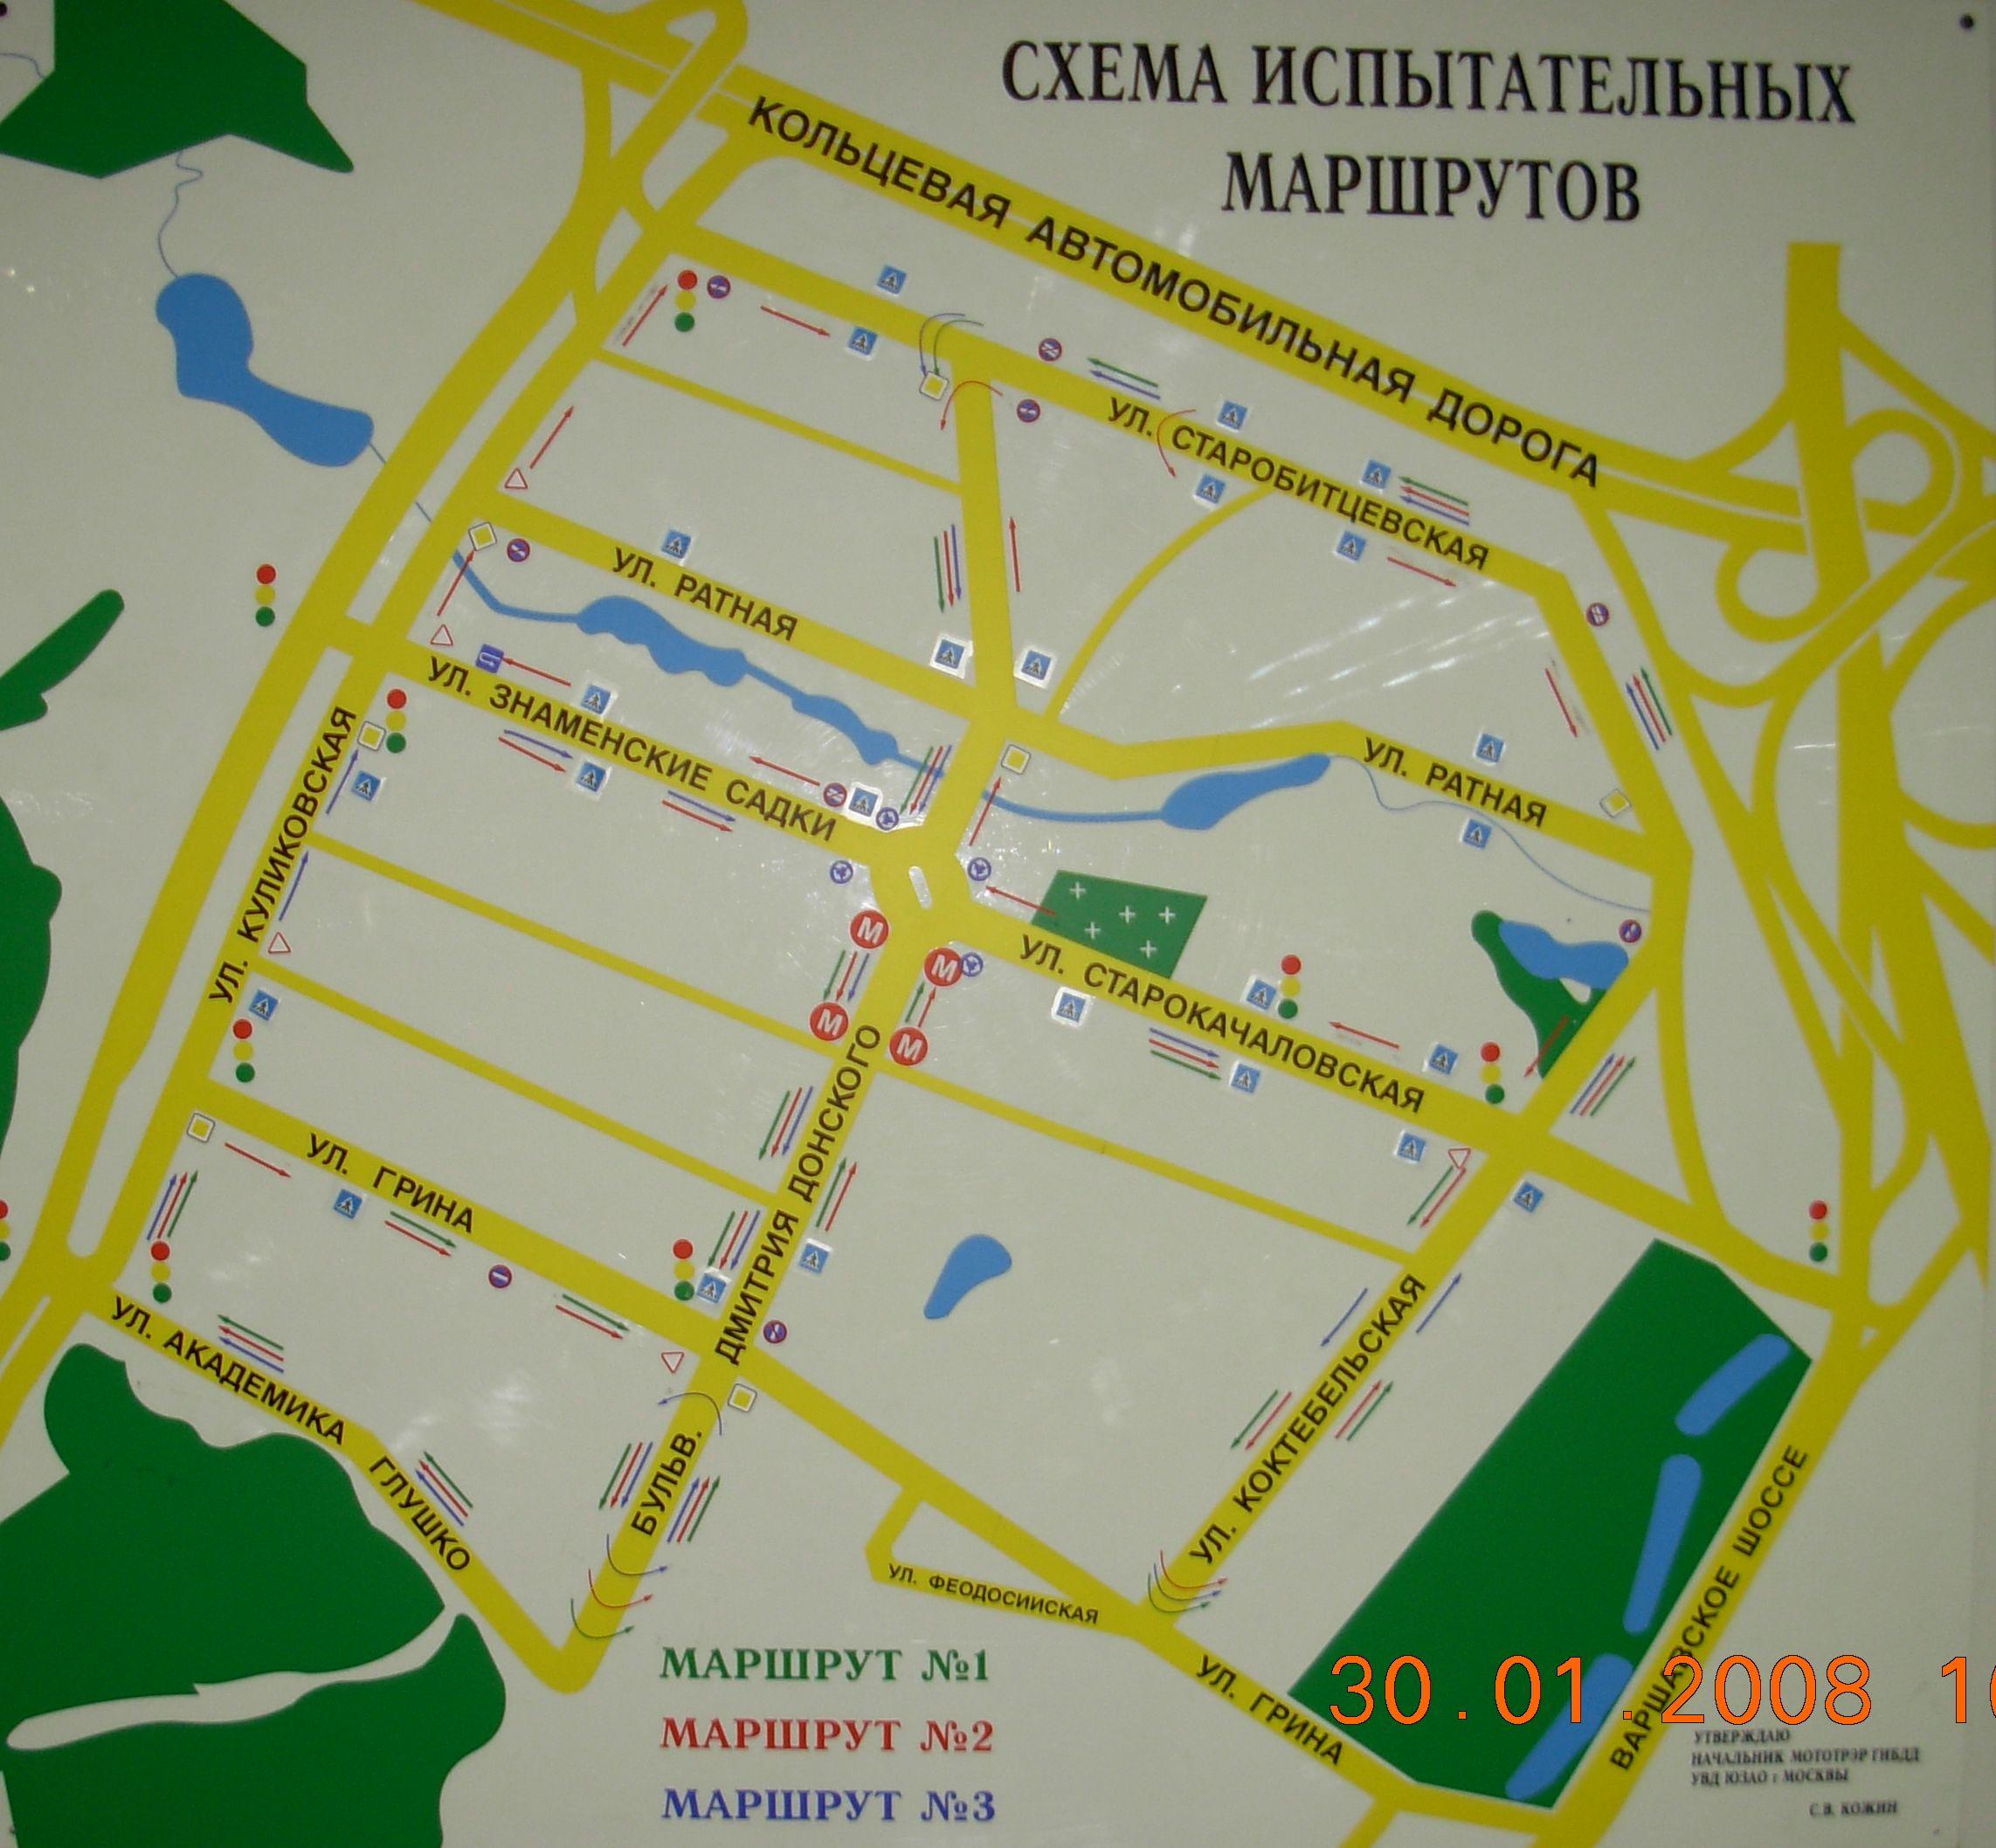 Варшавский маршрут гибдд схема